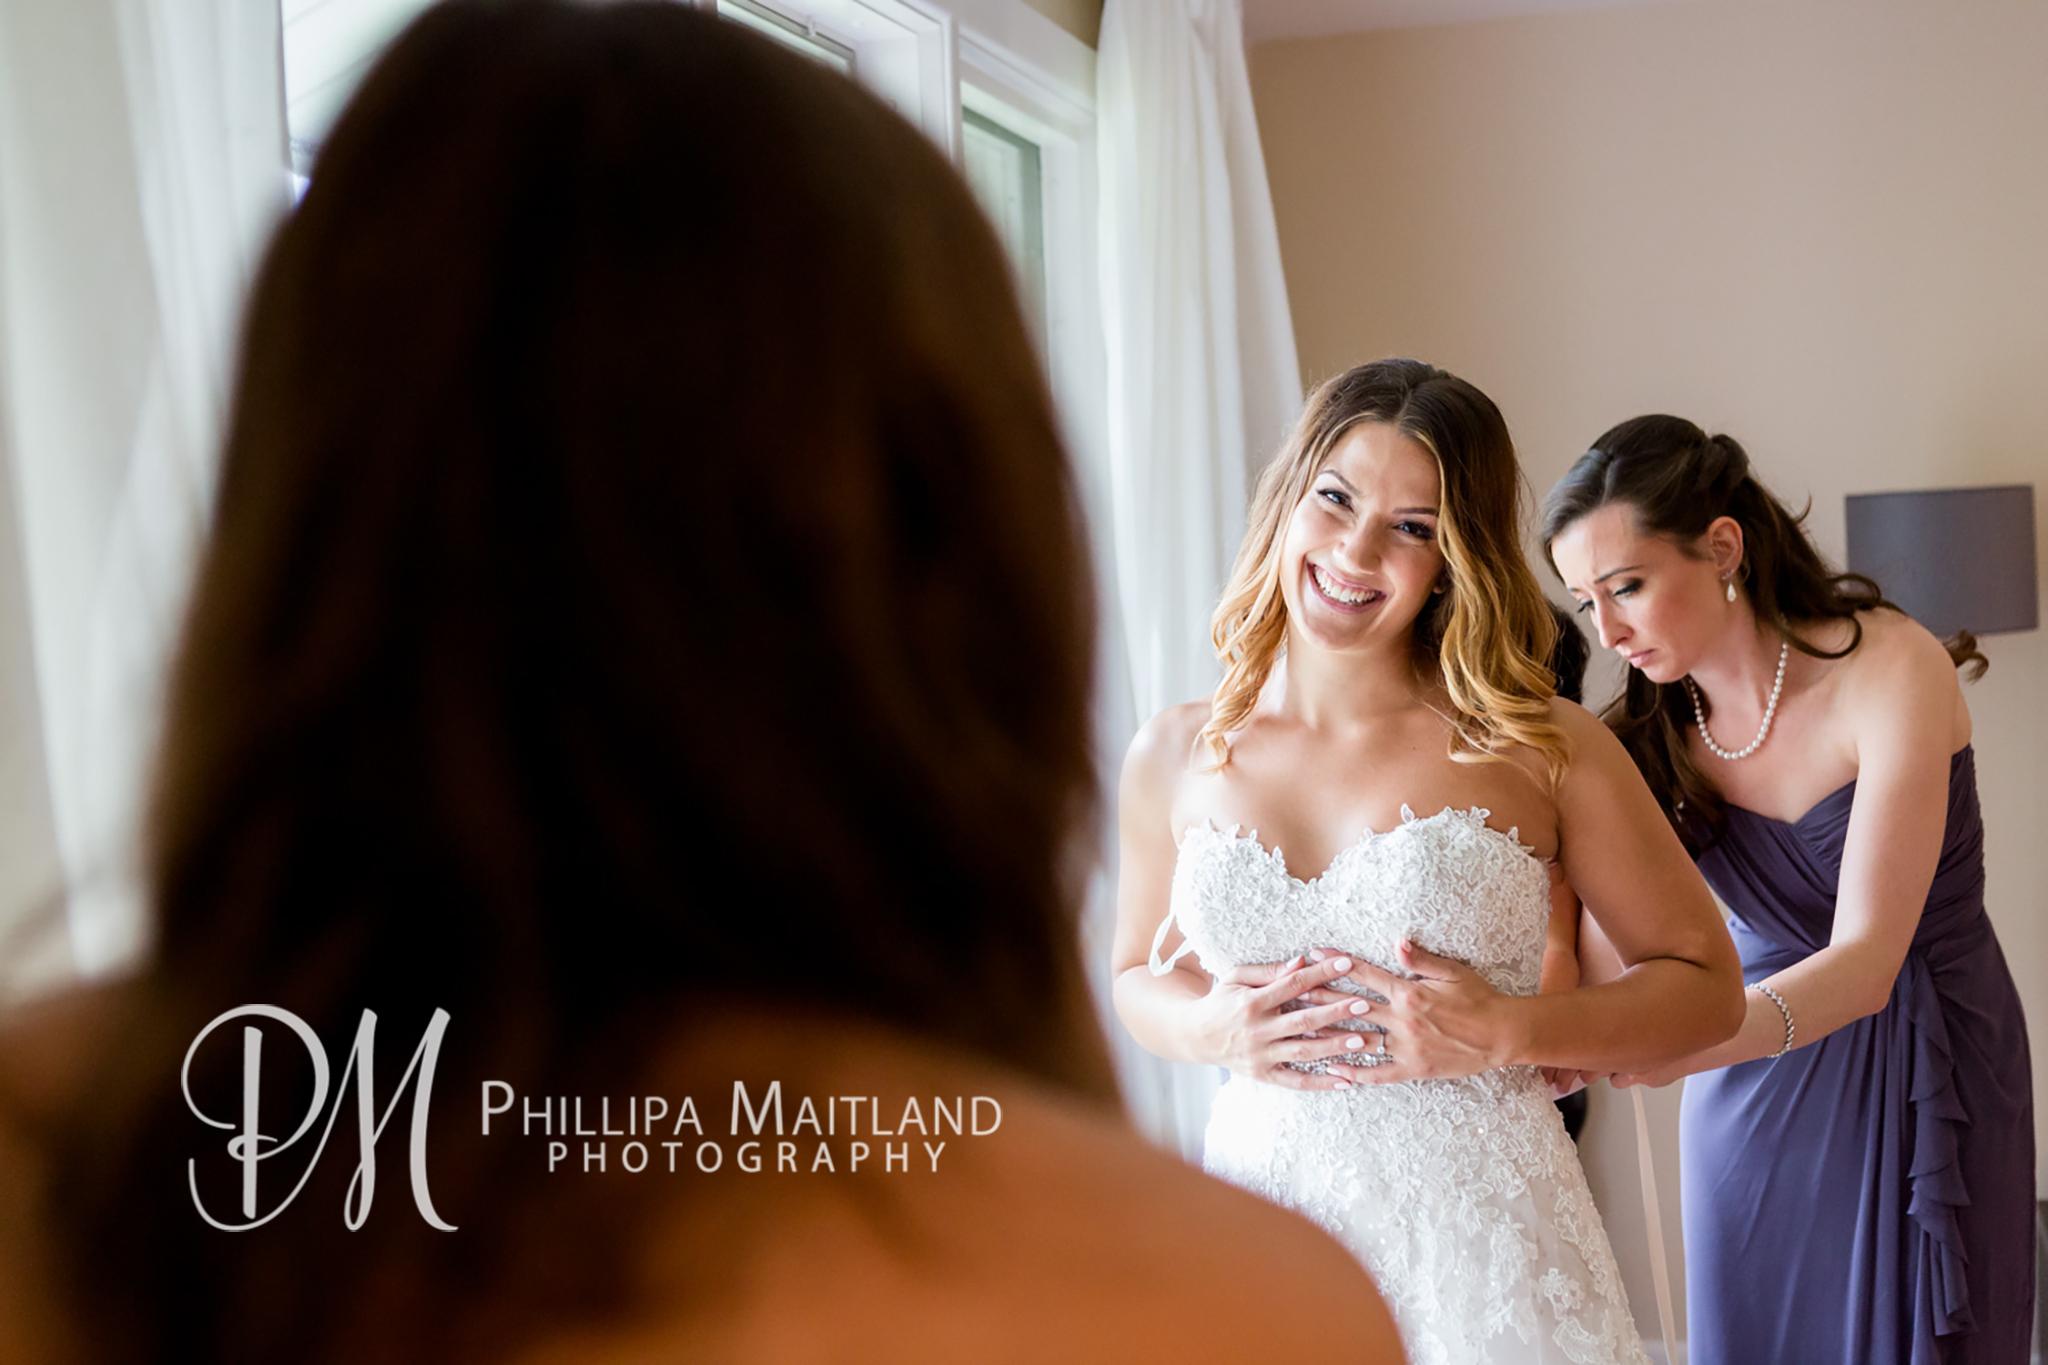 Ottawa Wedding Photographer 8.jpg